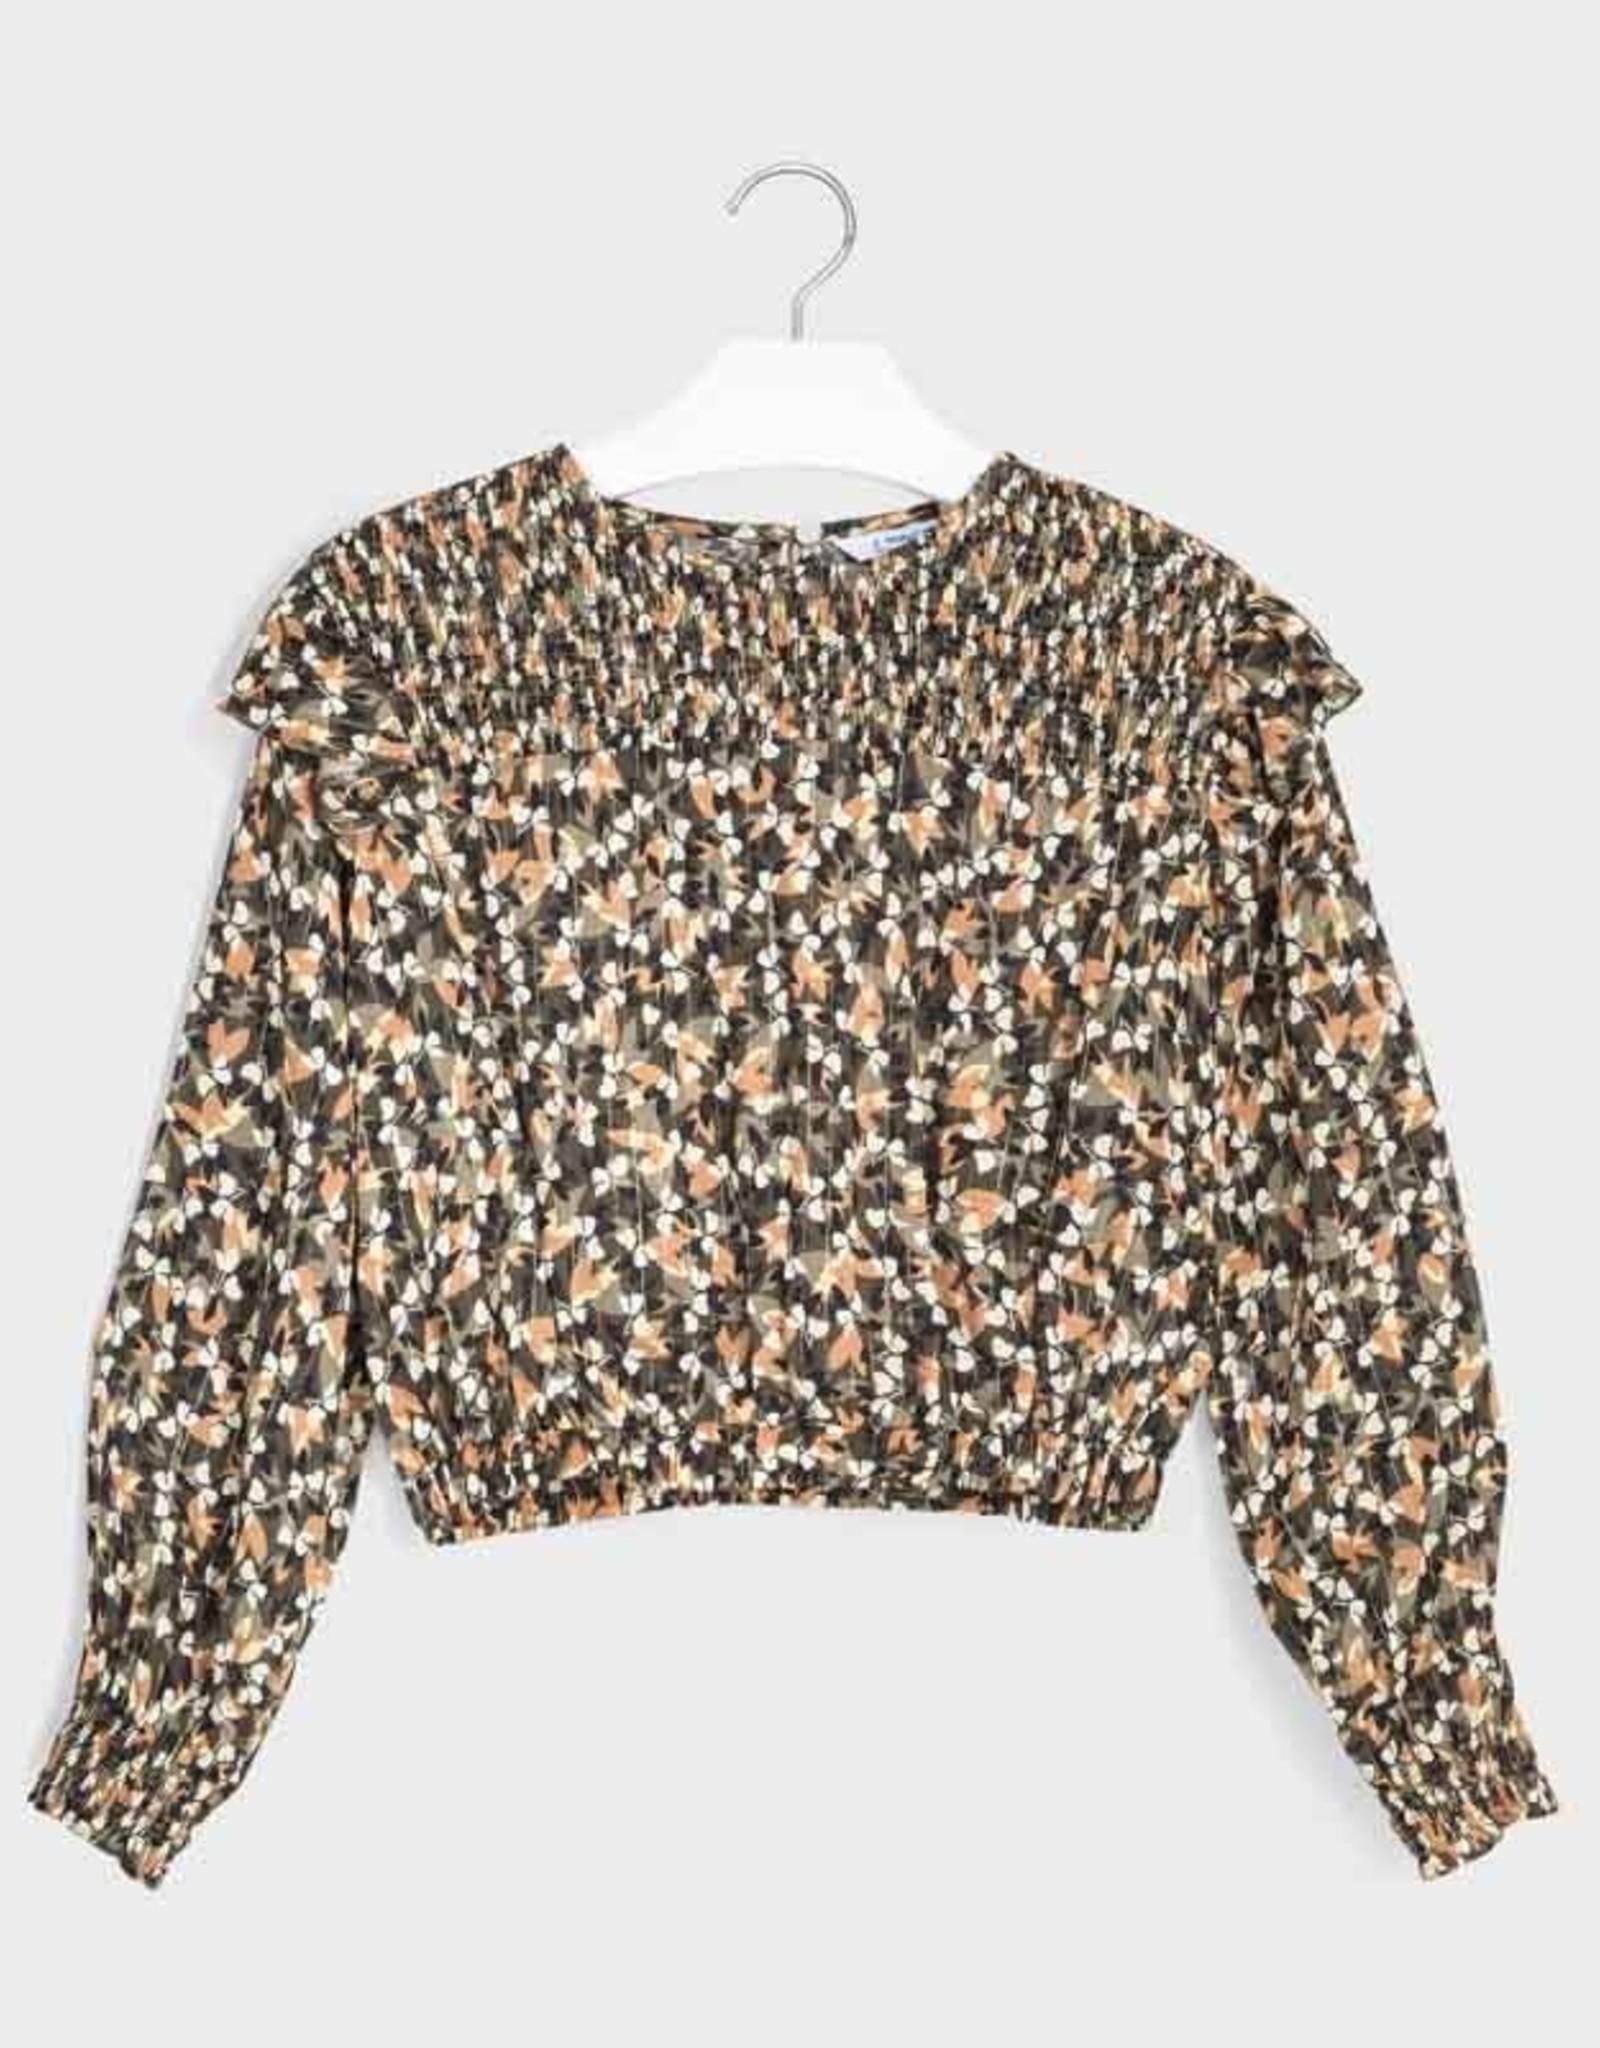 Mayoral MayoralLurex Patterned Ruffle Shirt Size 10